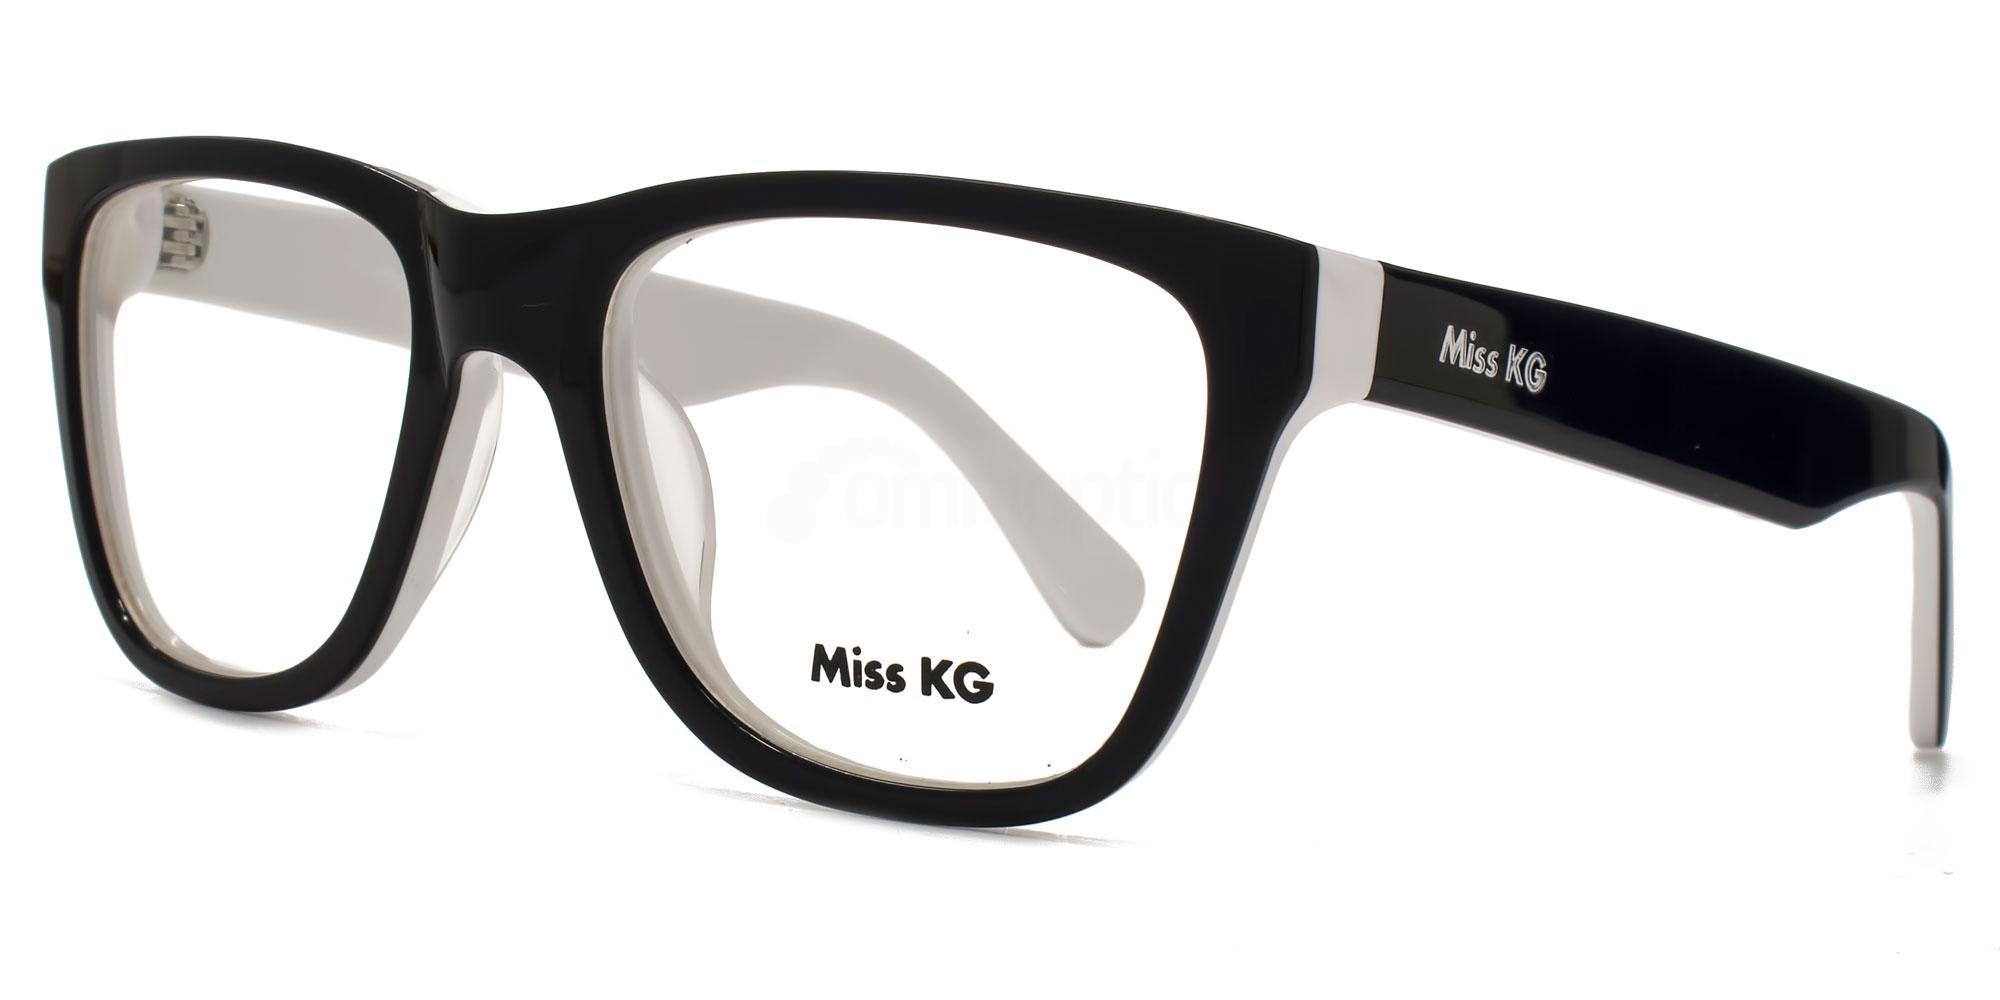 BLK MKGS001 , Miss KG